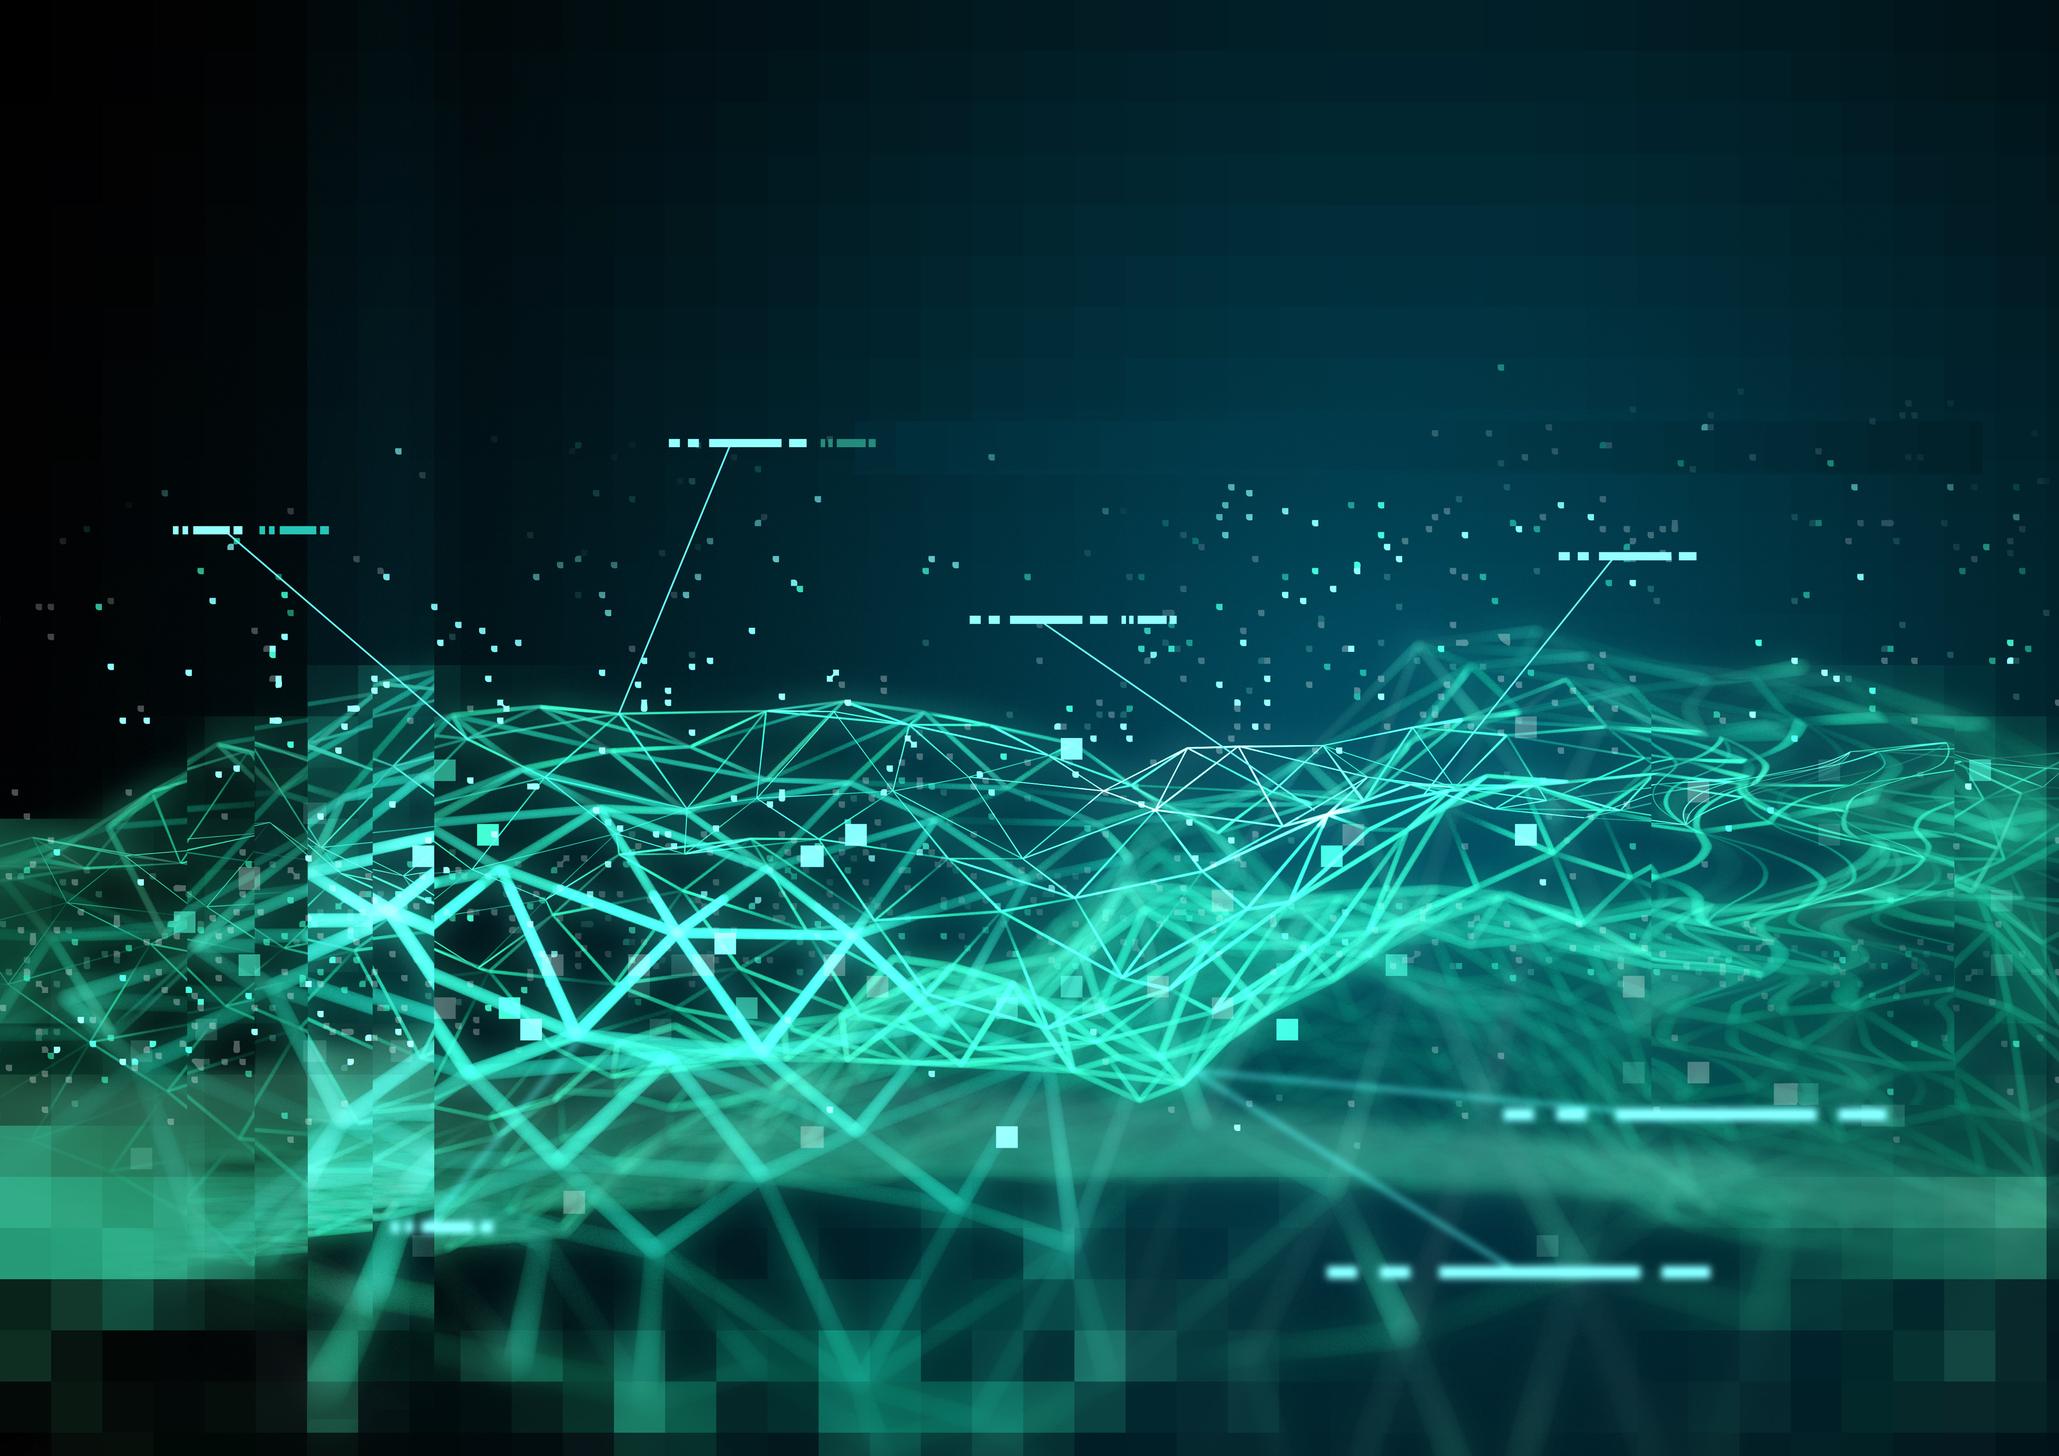 Abstract illustration of data mining